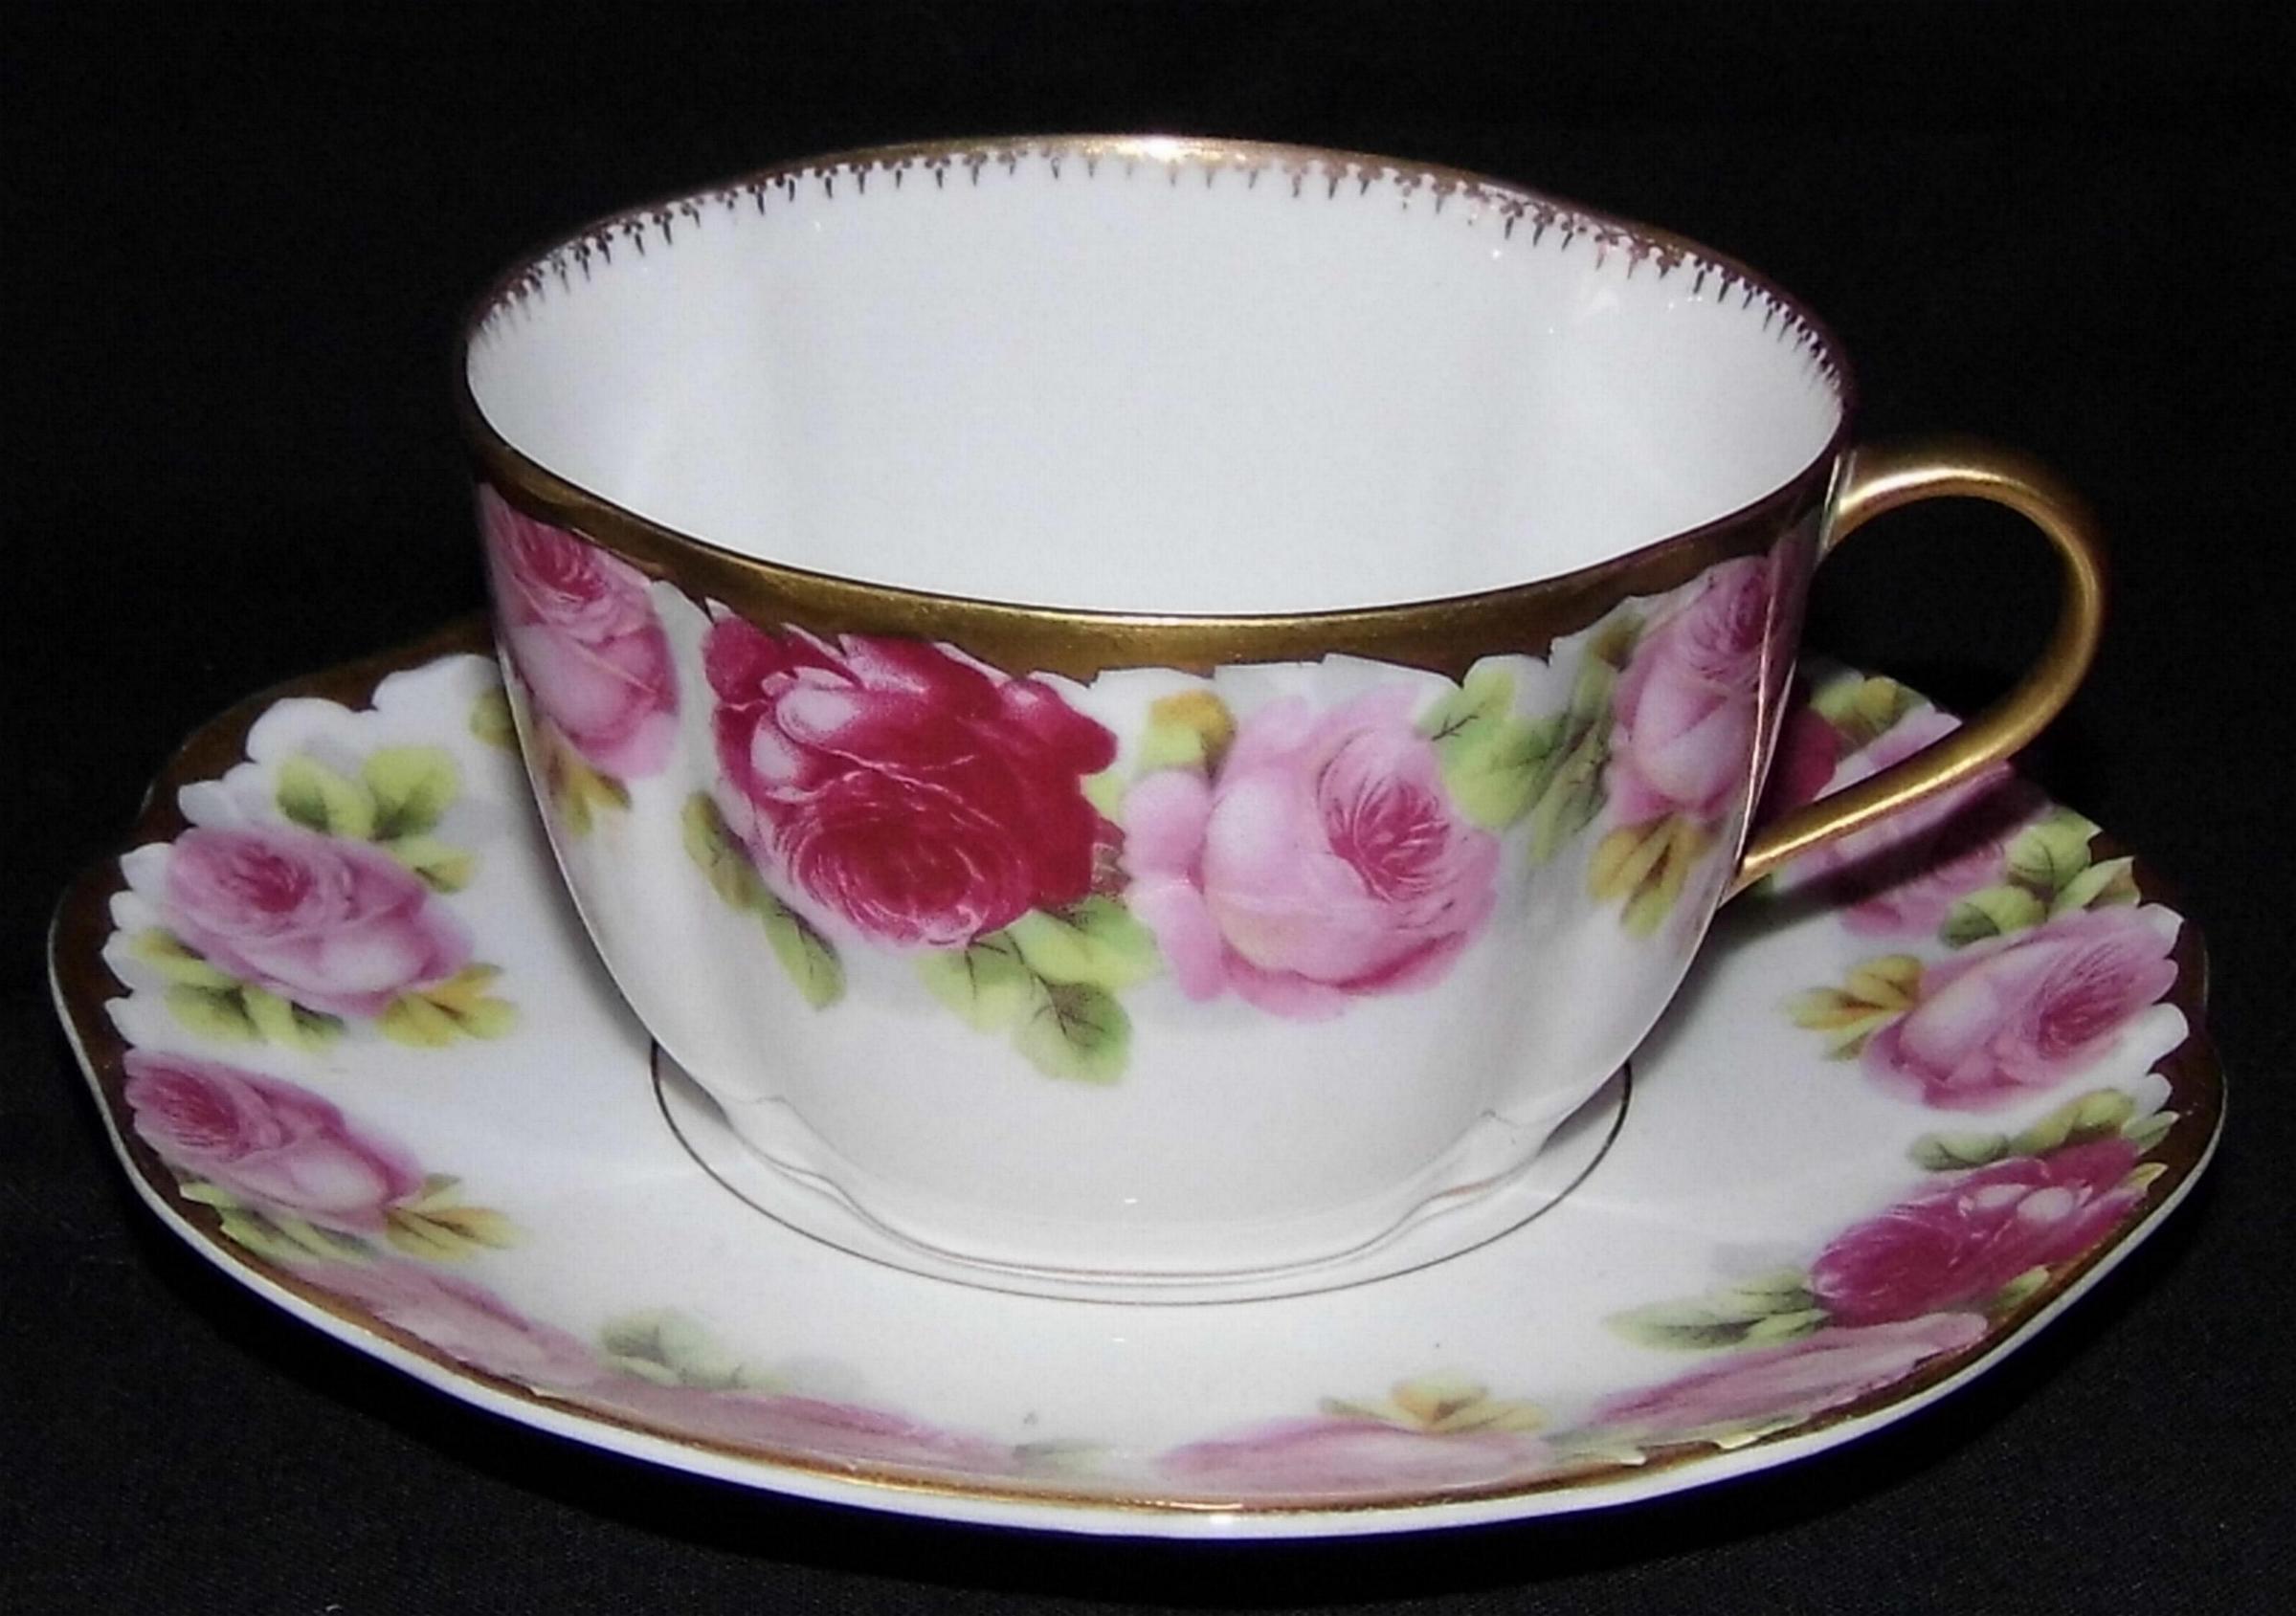 rosenthal chrysantheme c cilie teetasse 2 tlg 9 cm h 5 5 cm ut 15 cm 551 1041. Black Bedroom Furniture Sets. Home Design Ideas